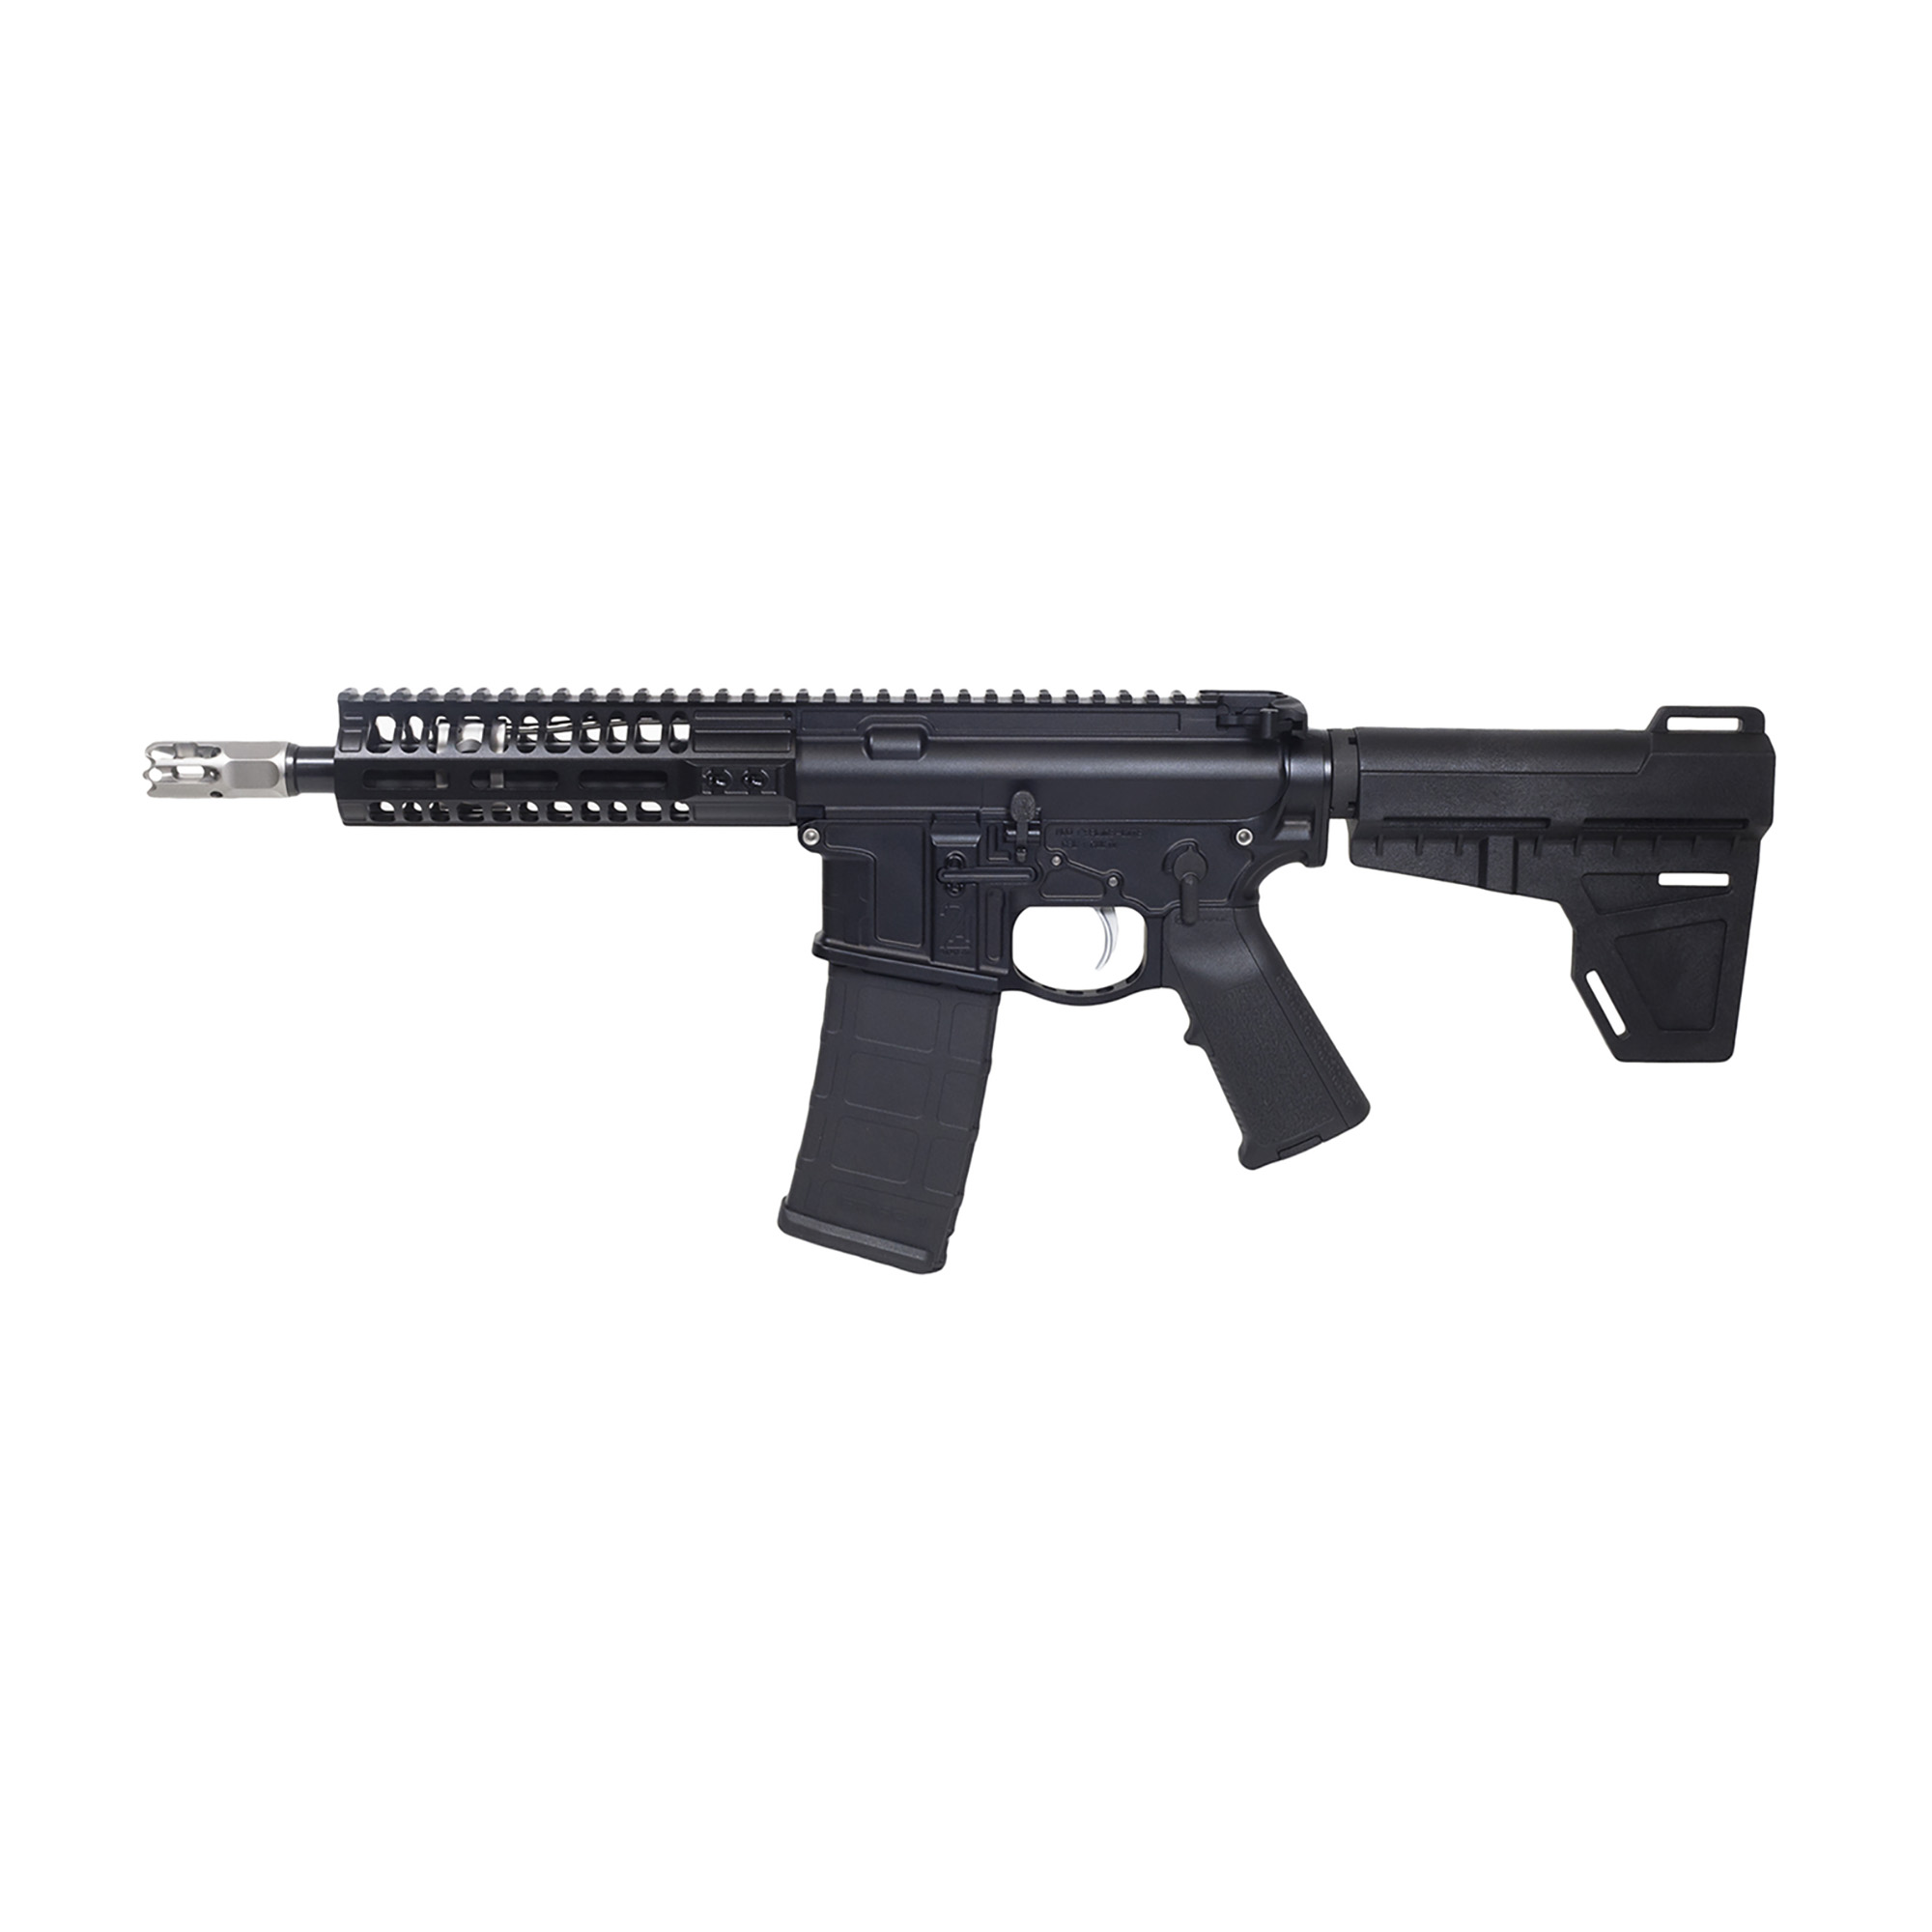 "2a Pistol 300blk 8"" M-lok Rail Blk"